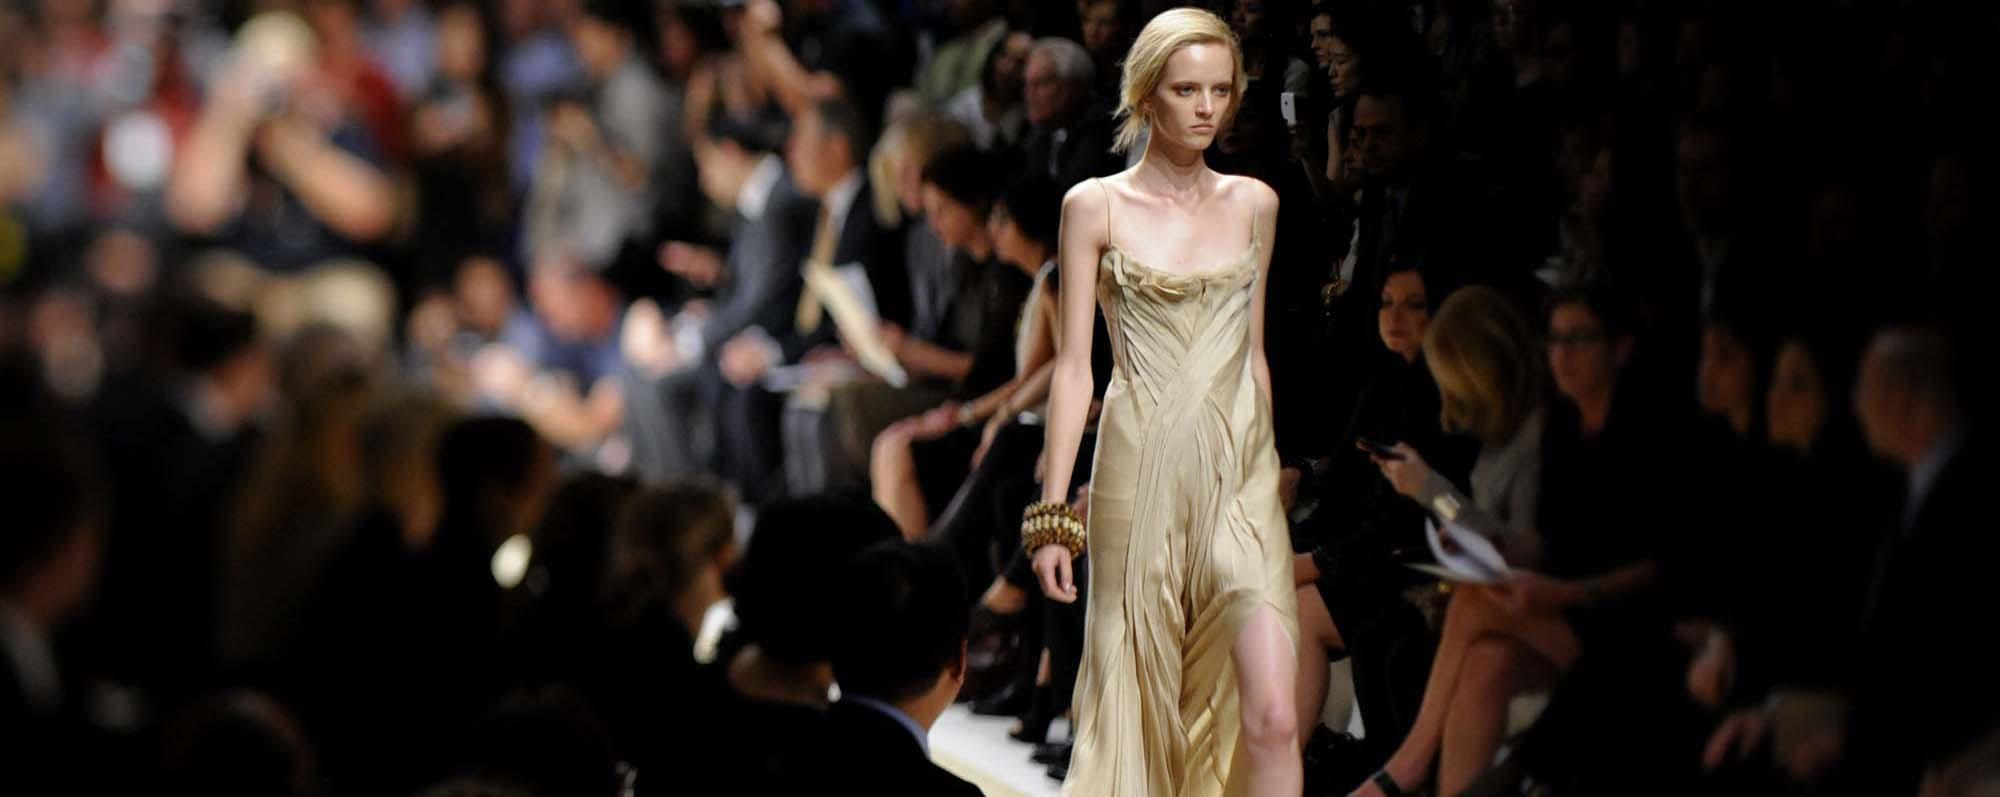 Celebrity Photos, Celebrity Pictures, Celebrity Pics E! News English music for fashion show